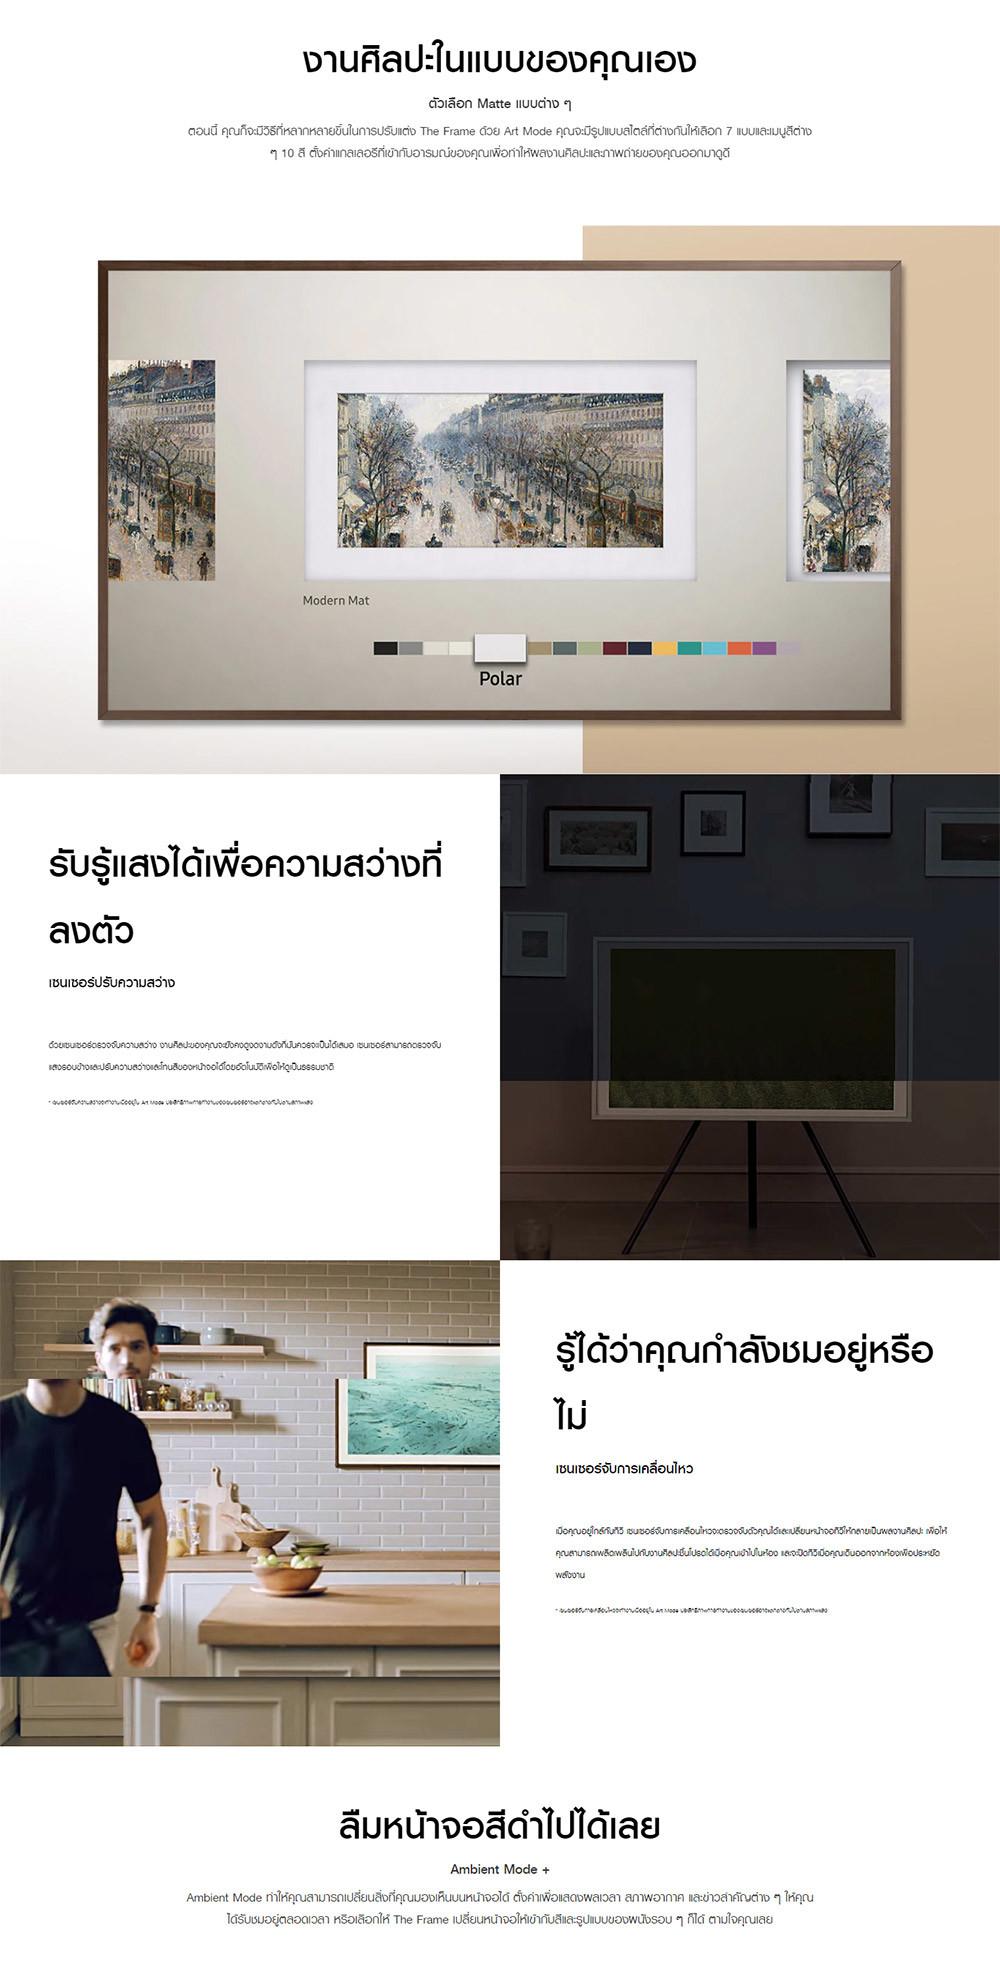 content-image_7.jpg